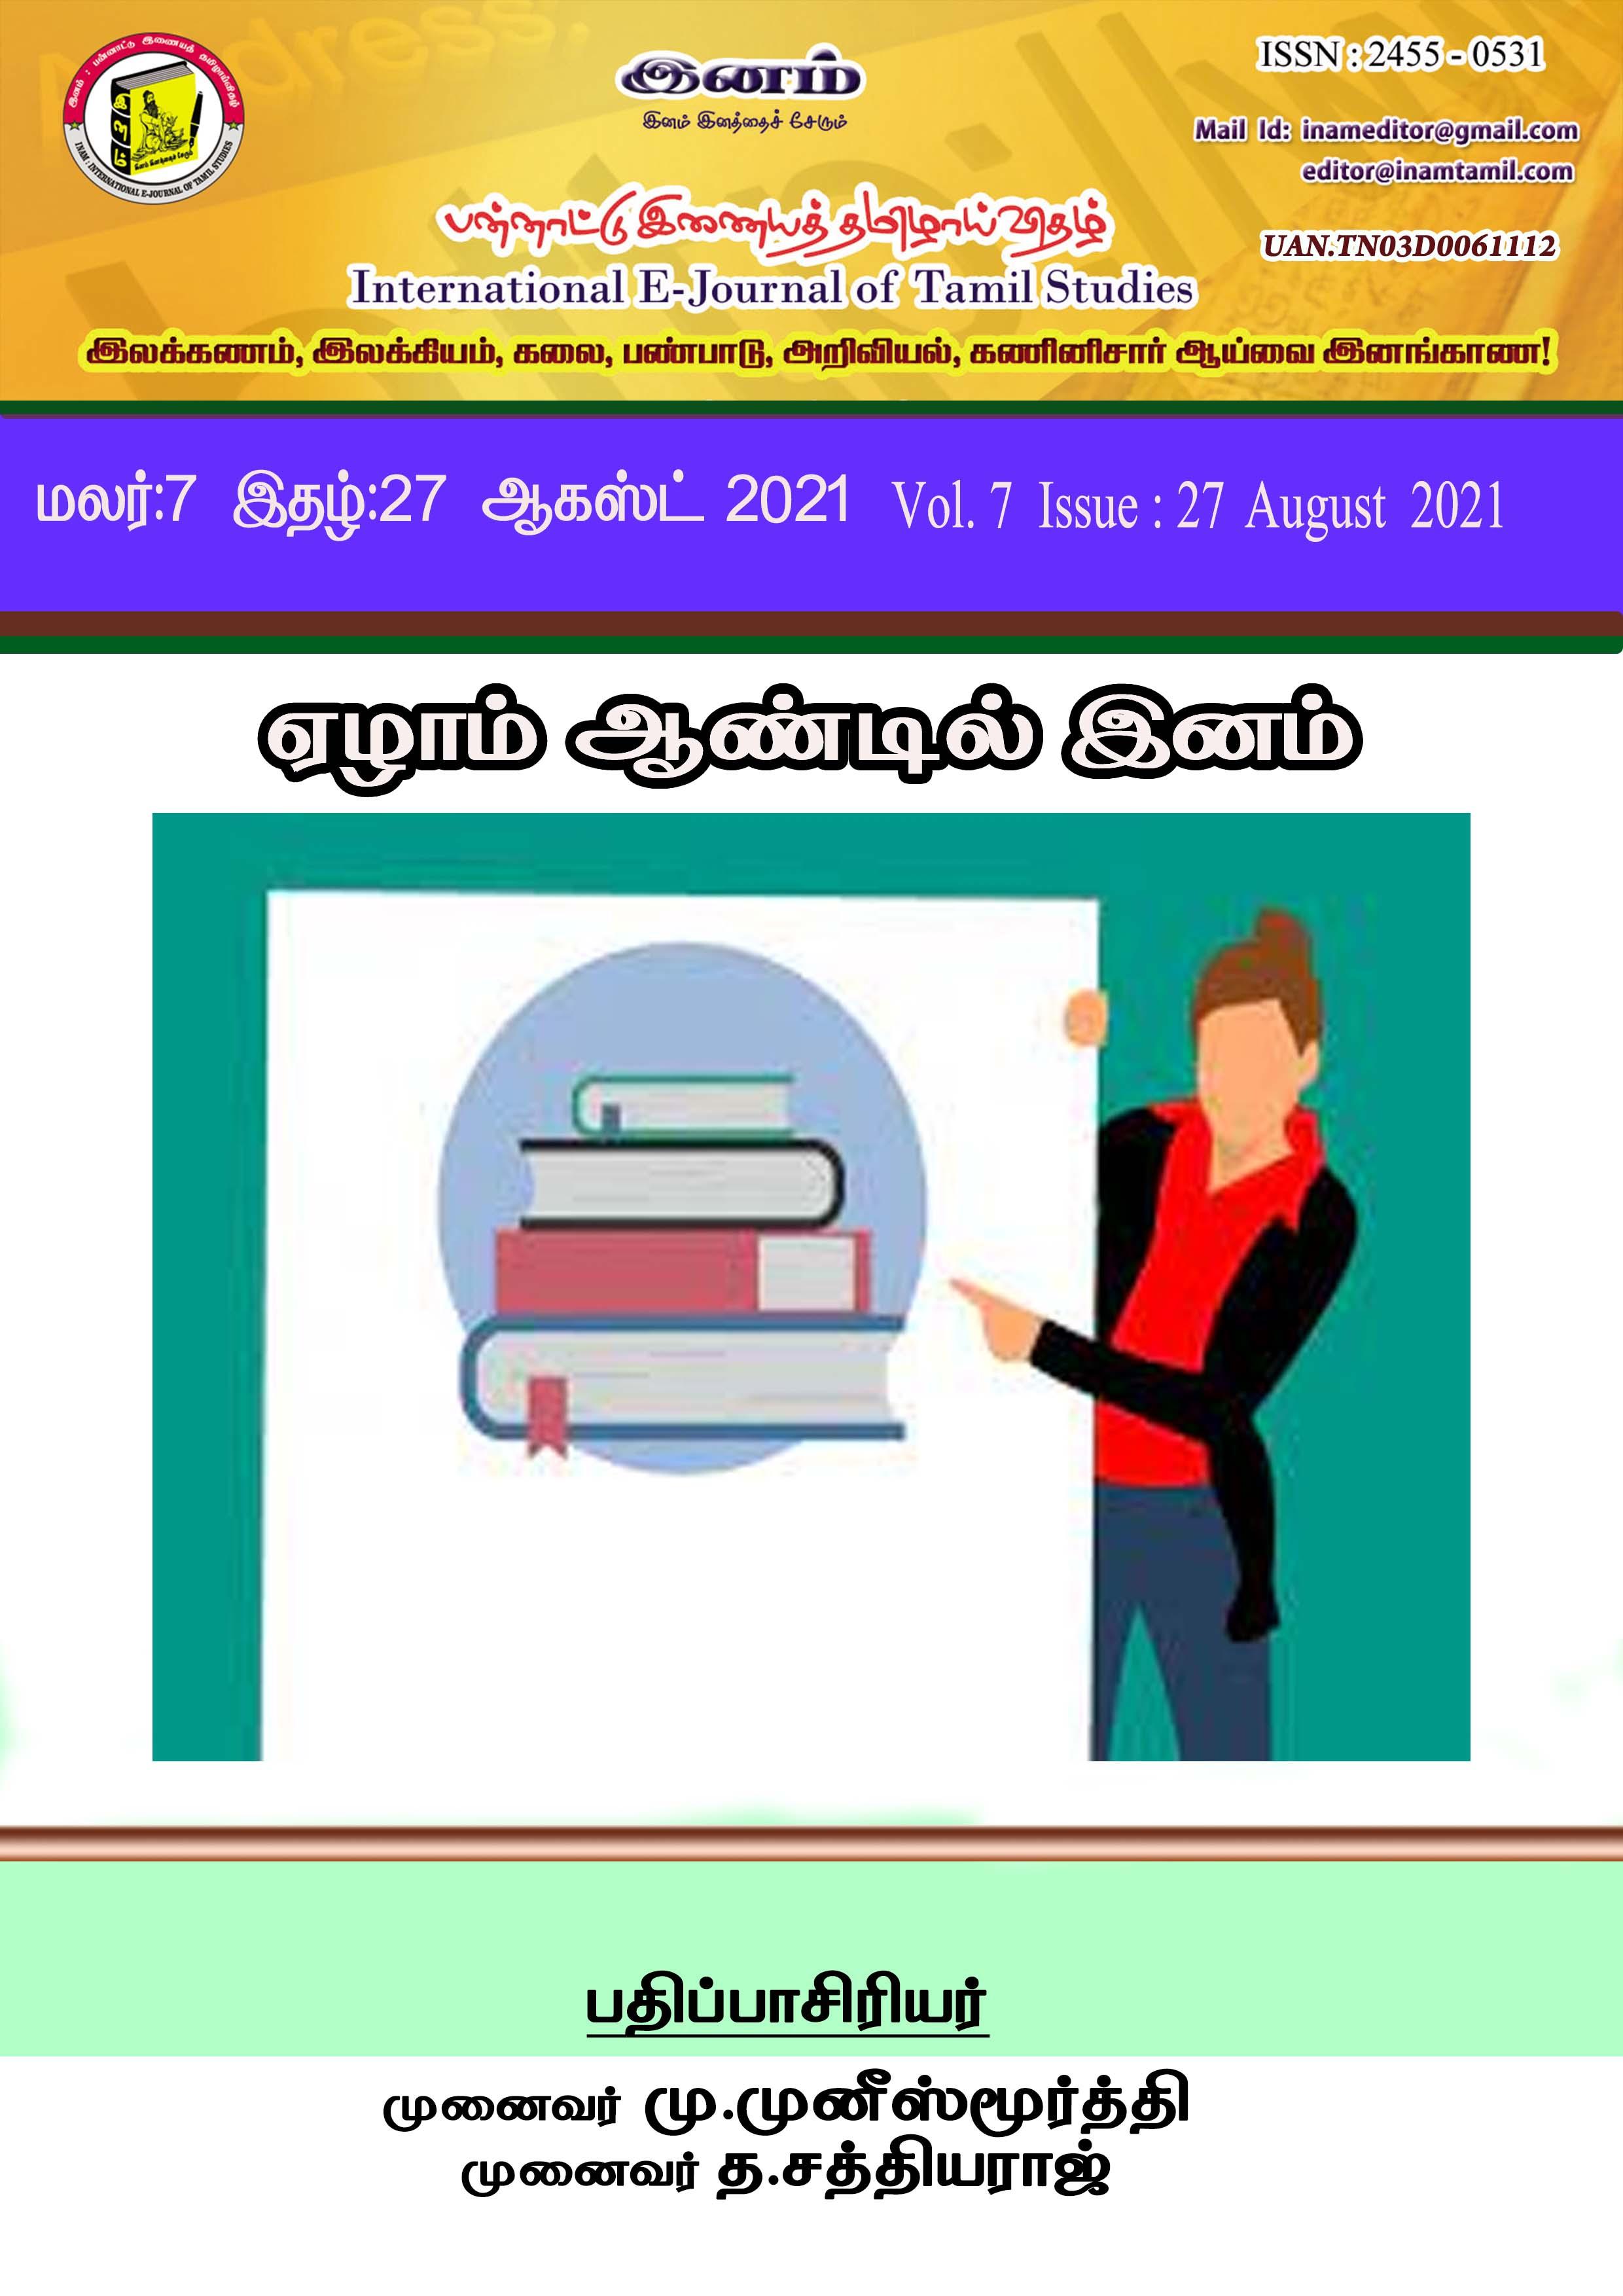 View Vol. 7 No. 27 (2021): இனம் பன்னாட்டு இணையத் தமிழாய்விதழ் (Inam Internation E-Journal of Tamil Studies - IIETS)